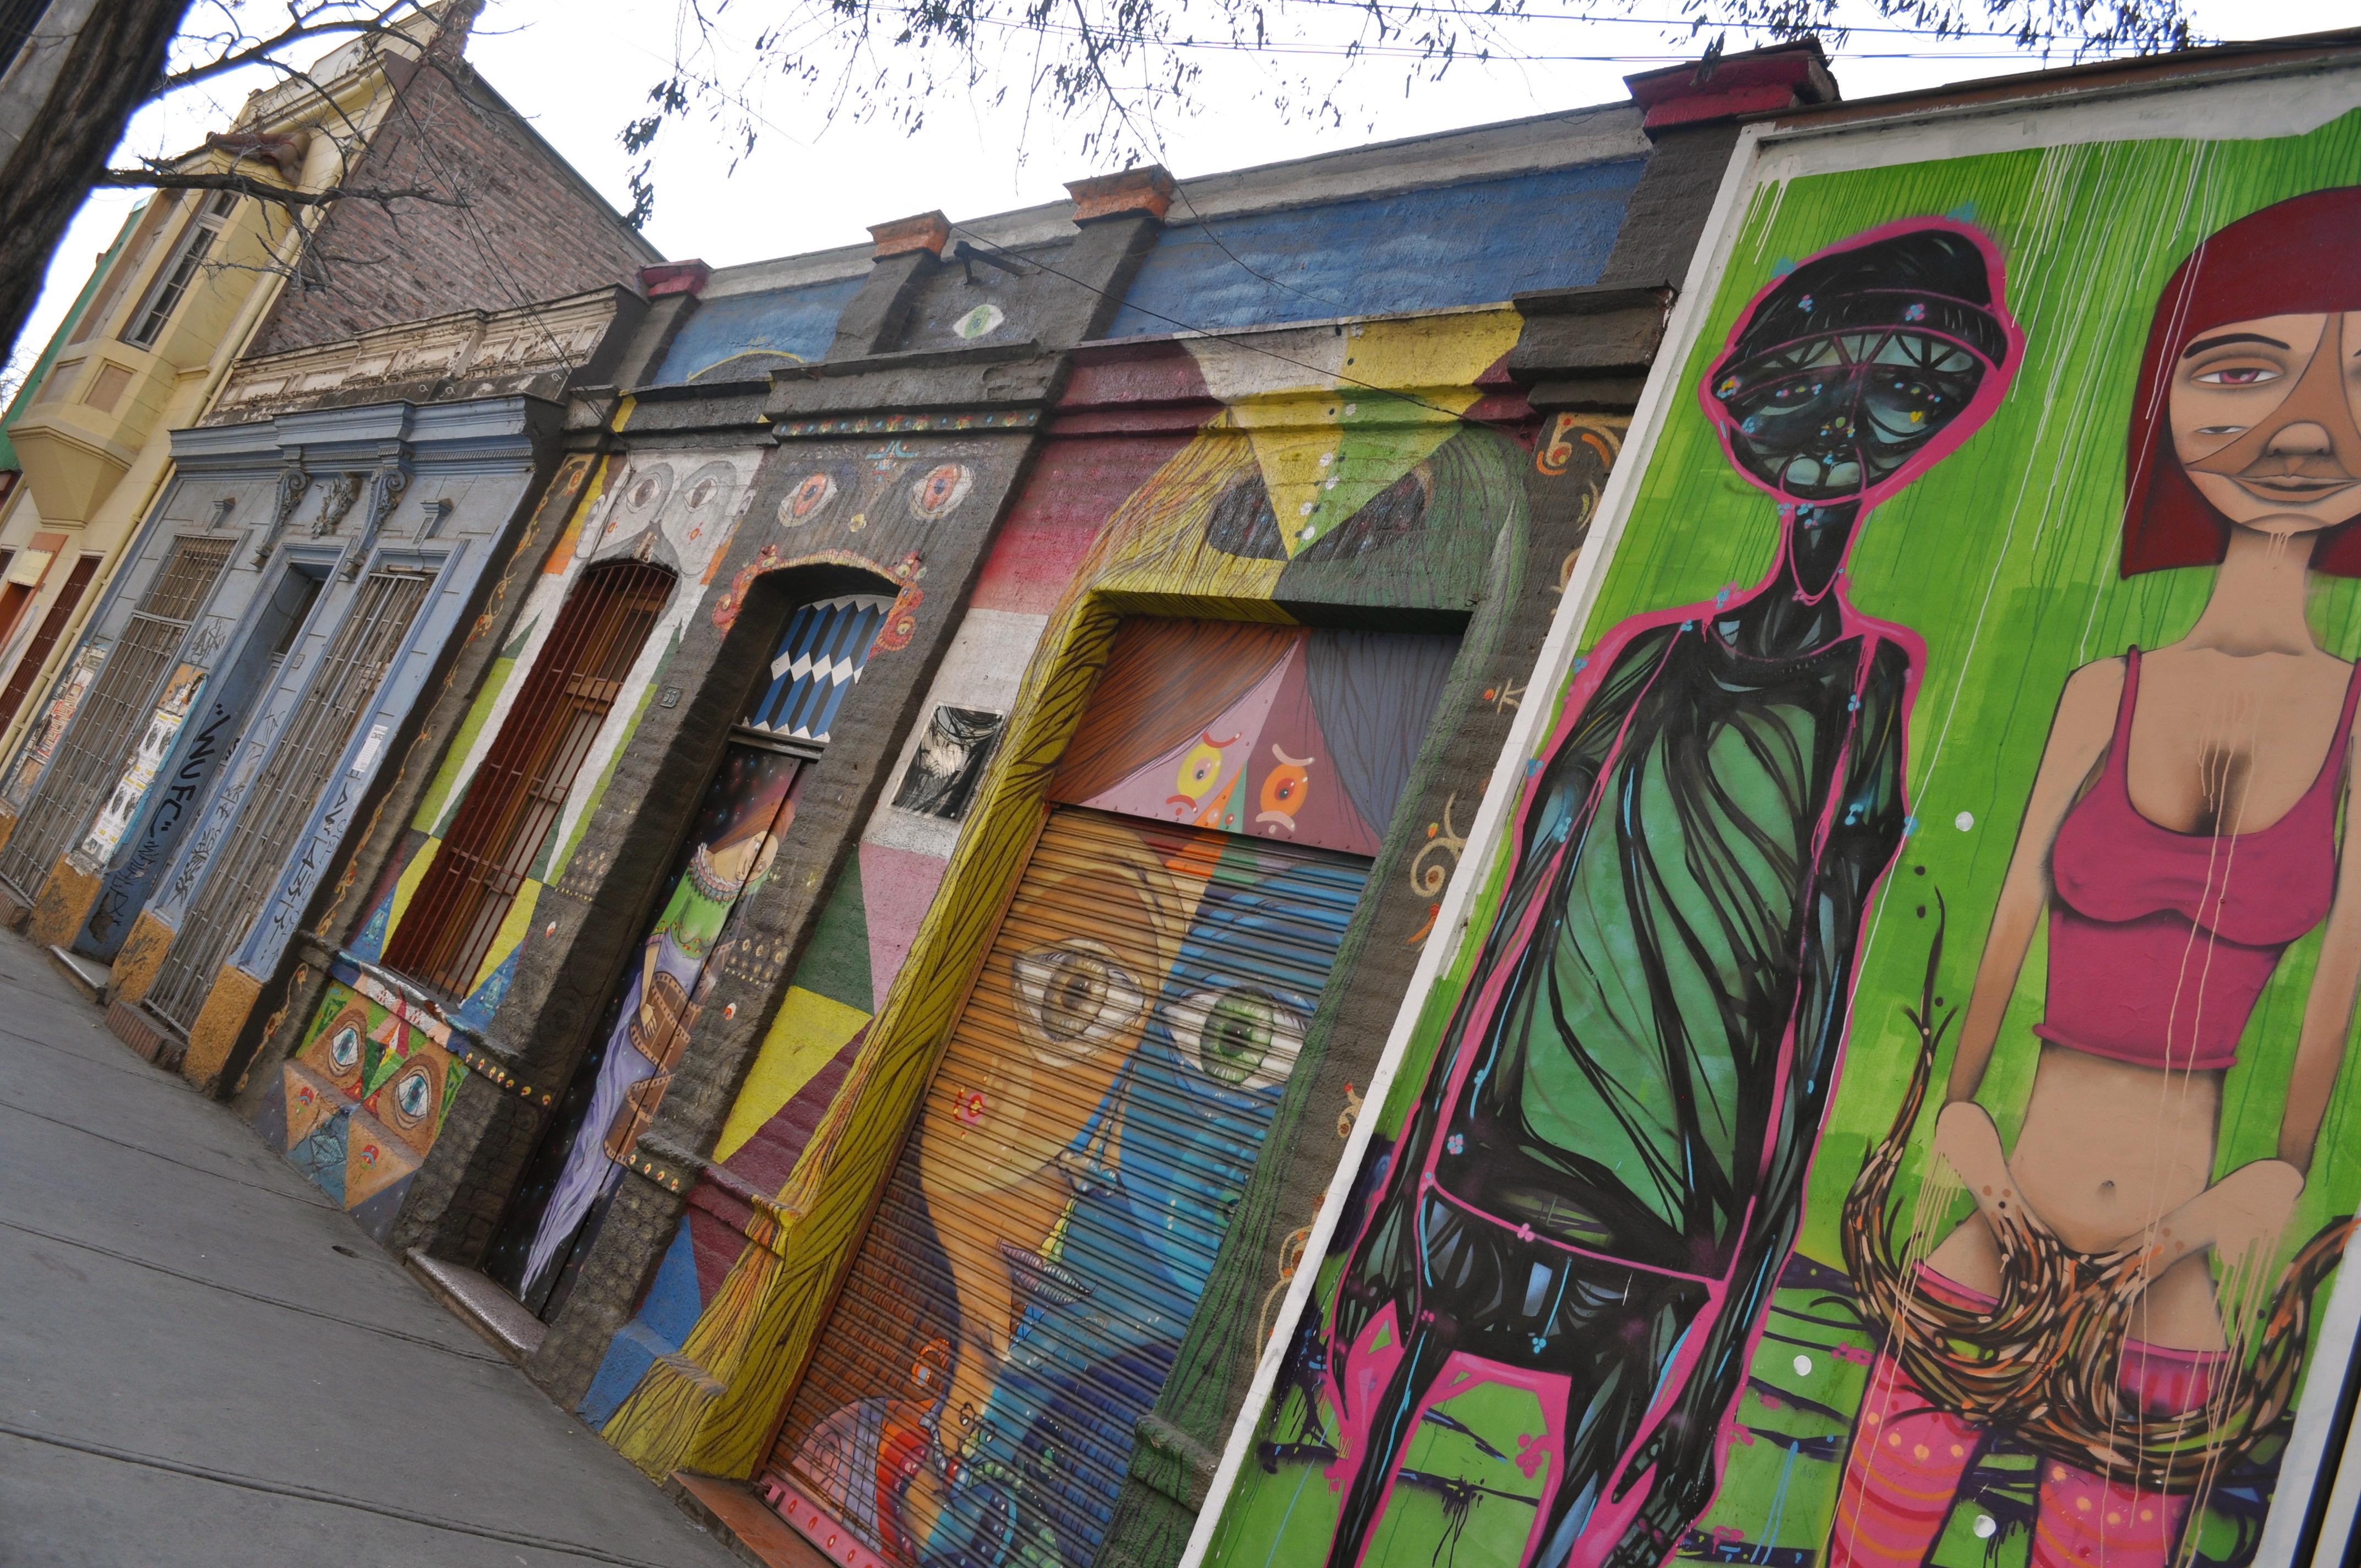 Santiago along the way for Carpenter papel mural santiago chile